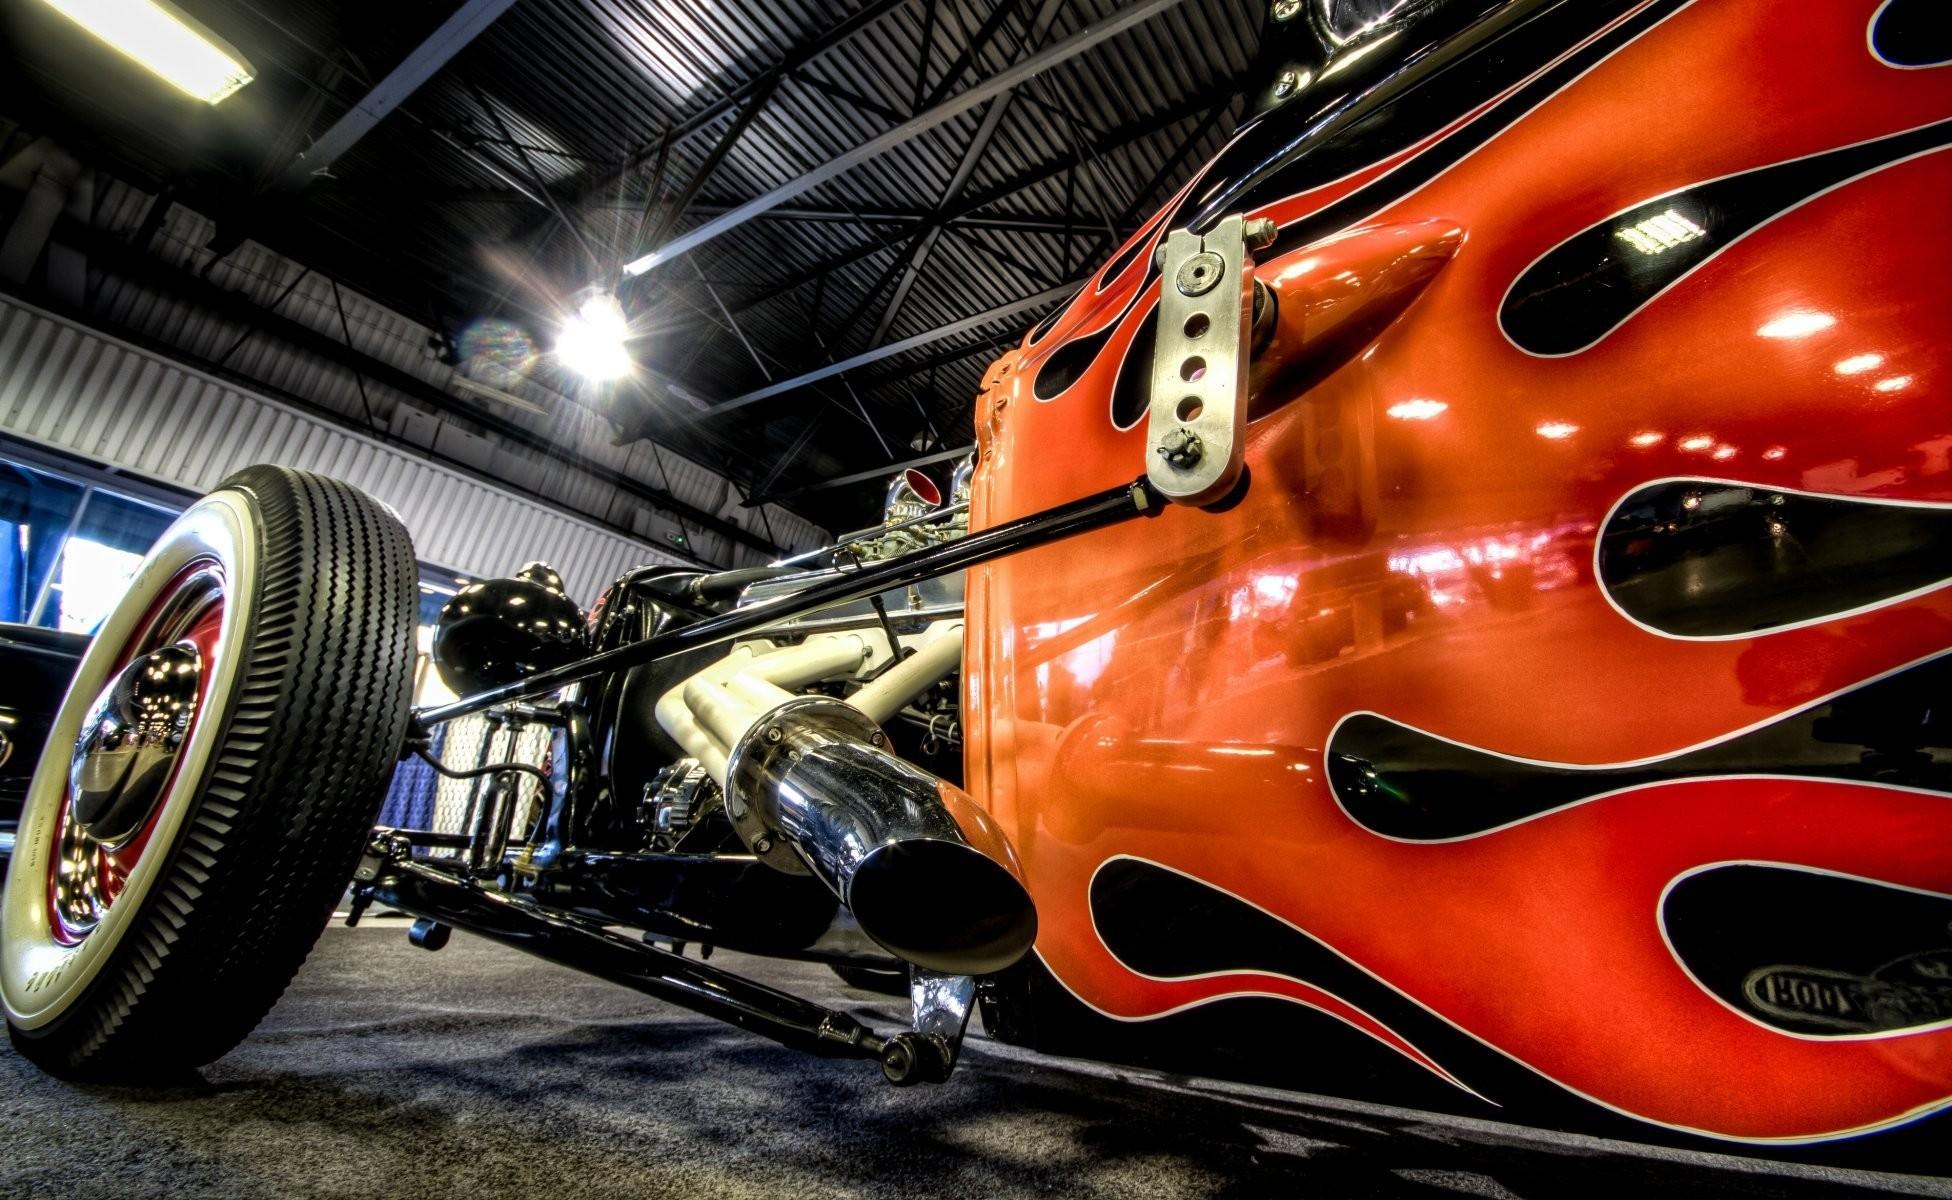 hot rod rat car classic engine machine turbine fire flame